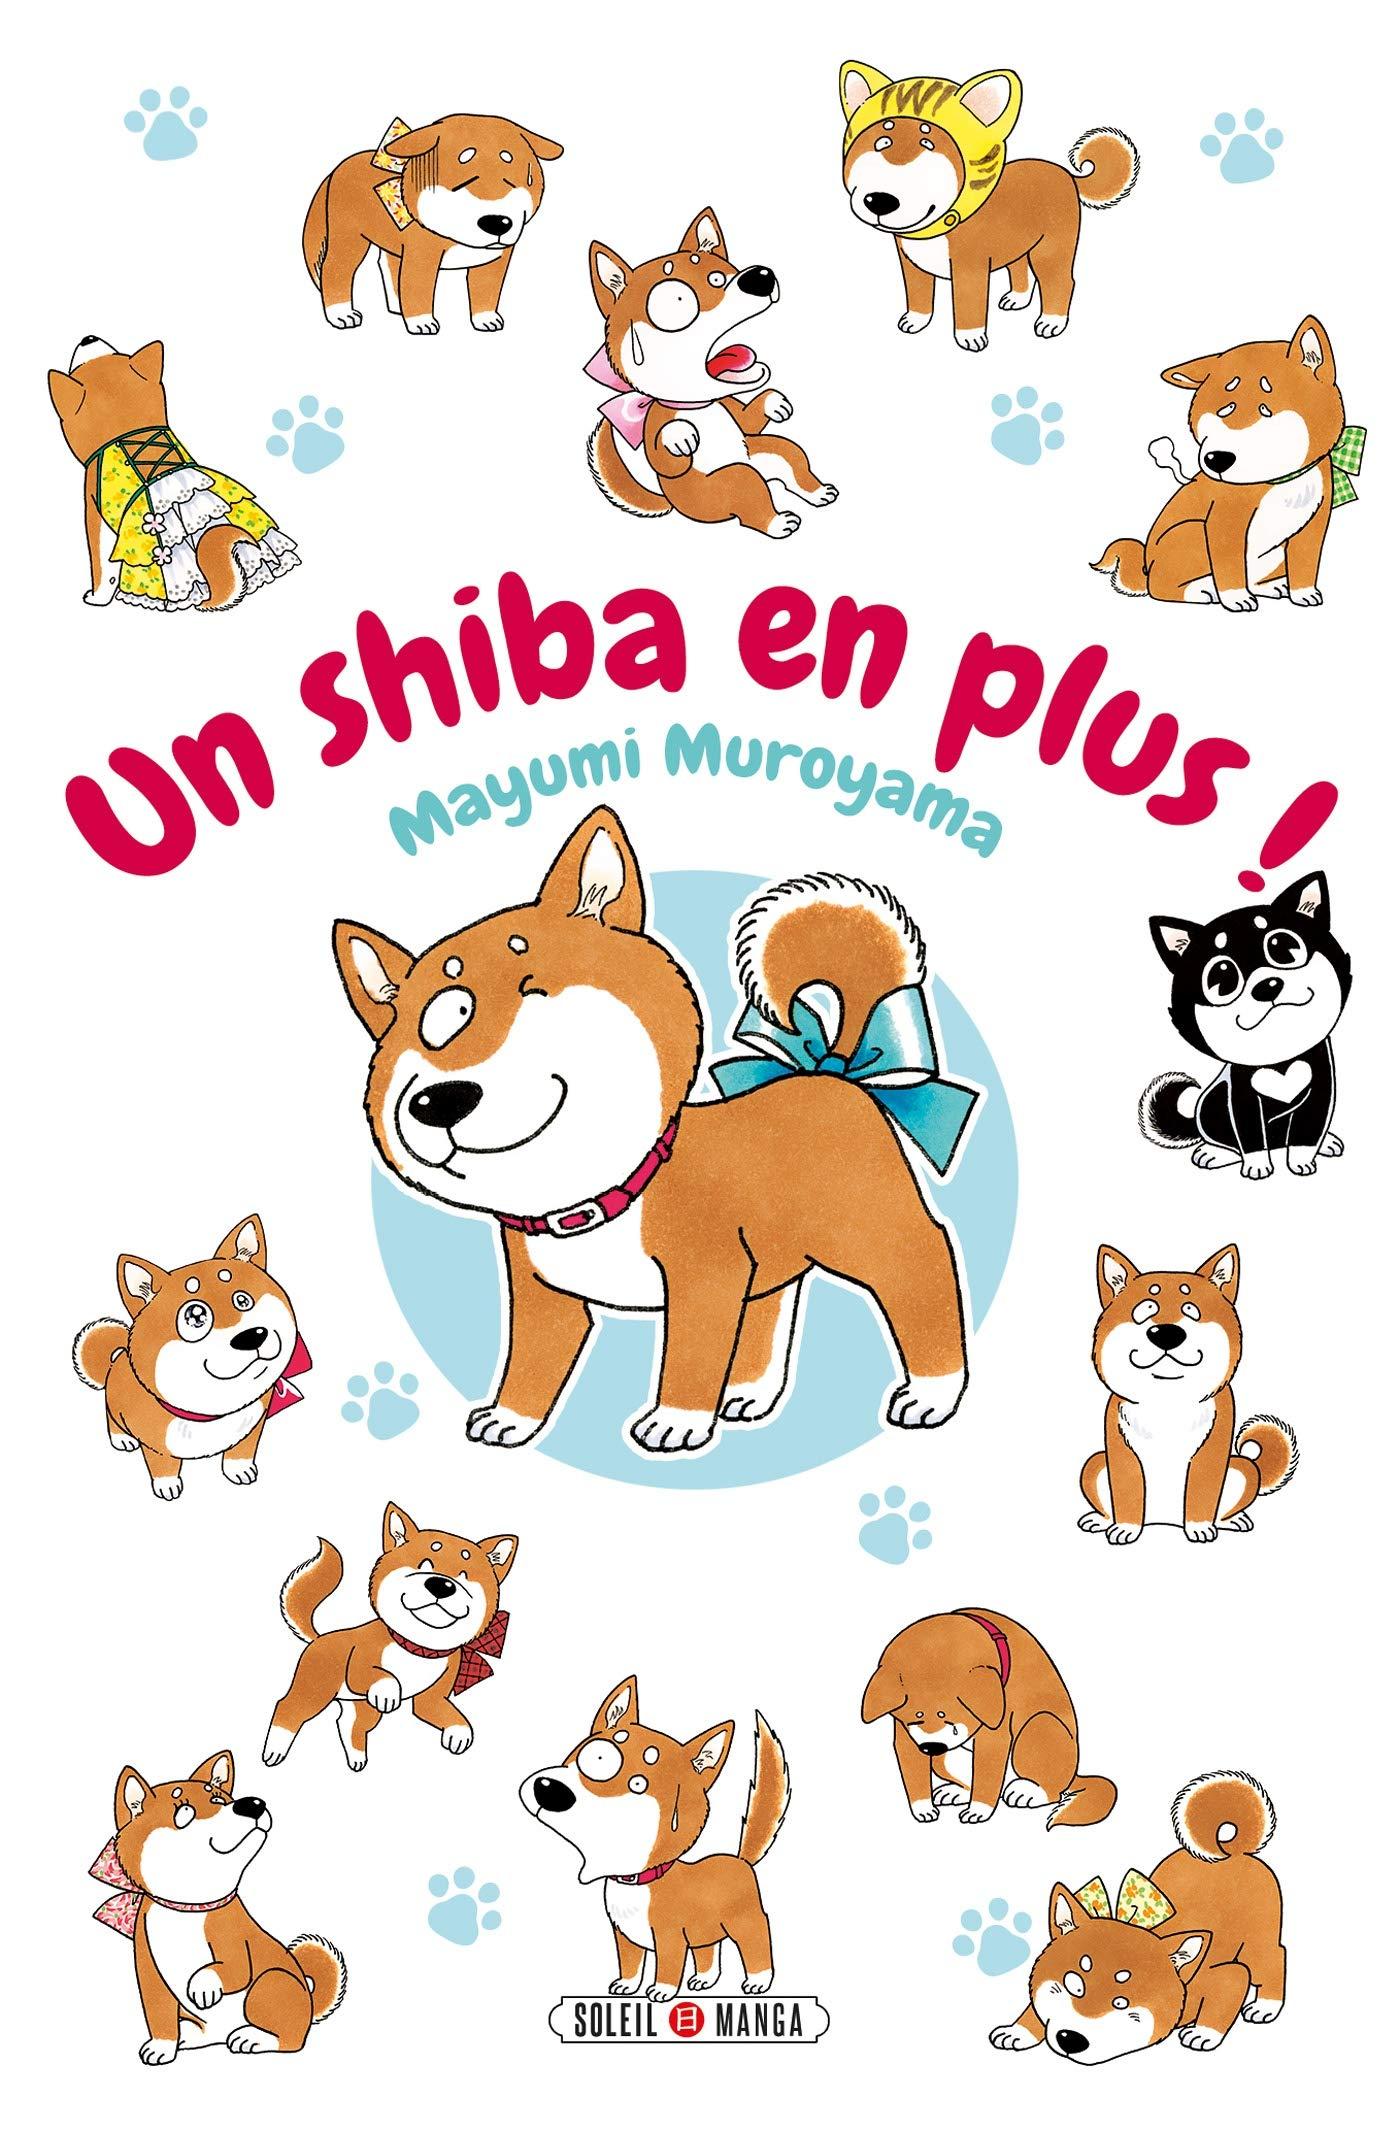 https://www.geekjunior.fr/wp-content/uploads/2019/03/shiba-manga.jpg